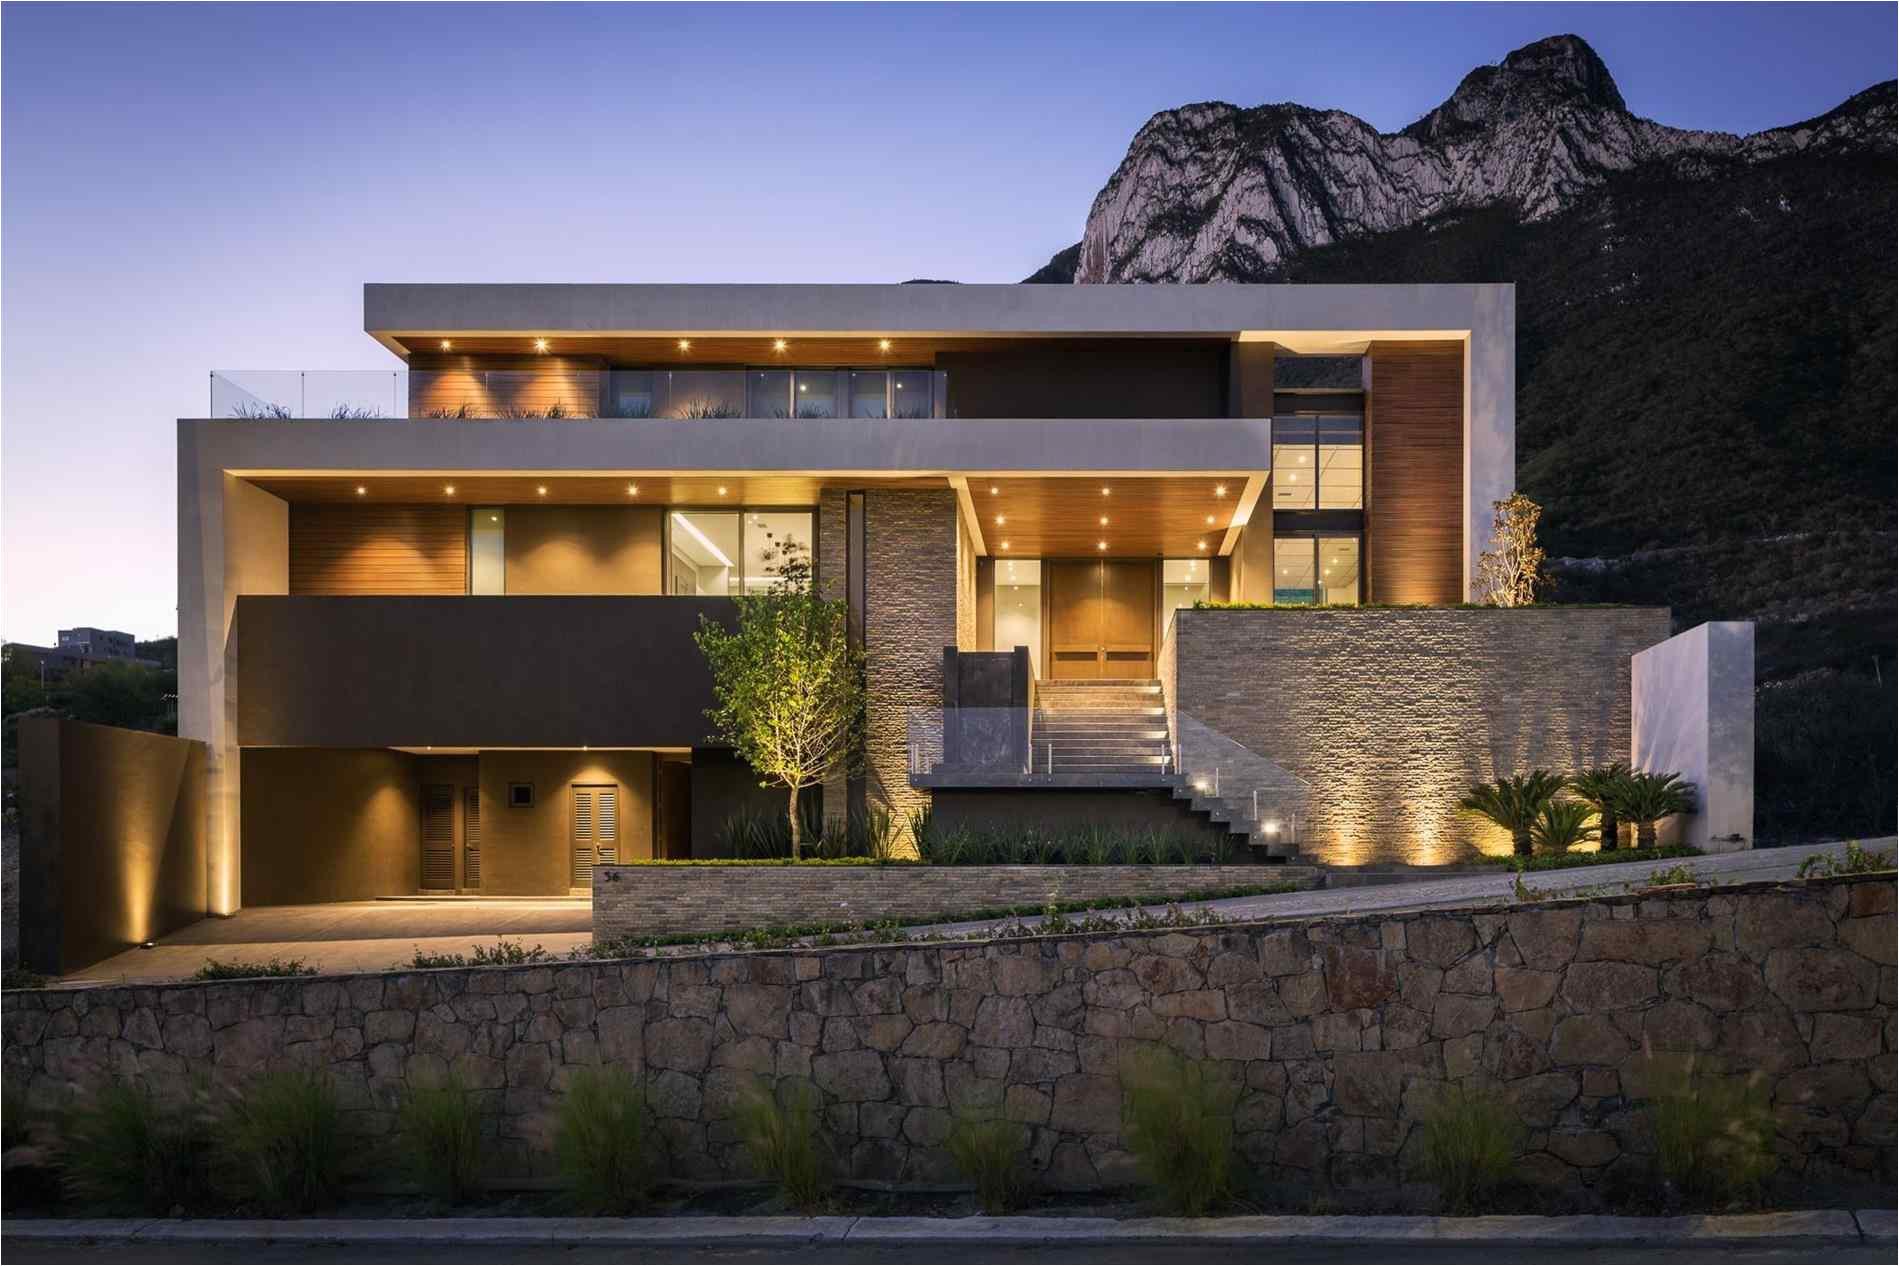 modern luxury house plans and designs modern luxury house plans and designs photos best rheumolpus design beautiful s home exterior rhclassicsbeautycom modern jpg